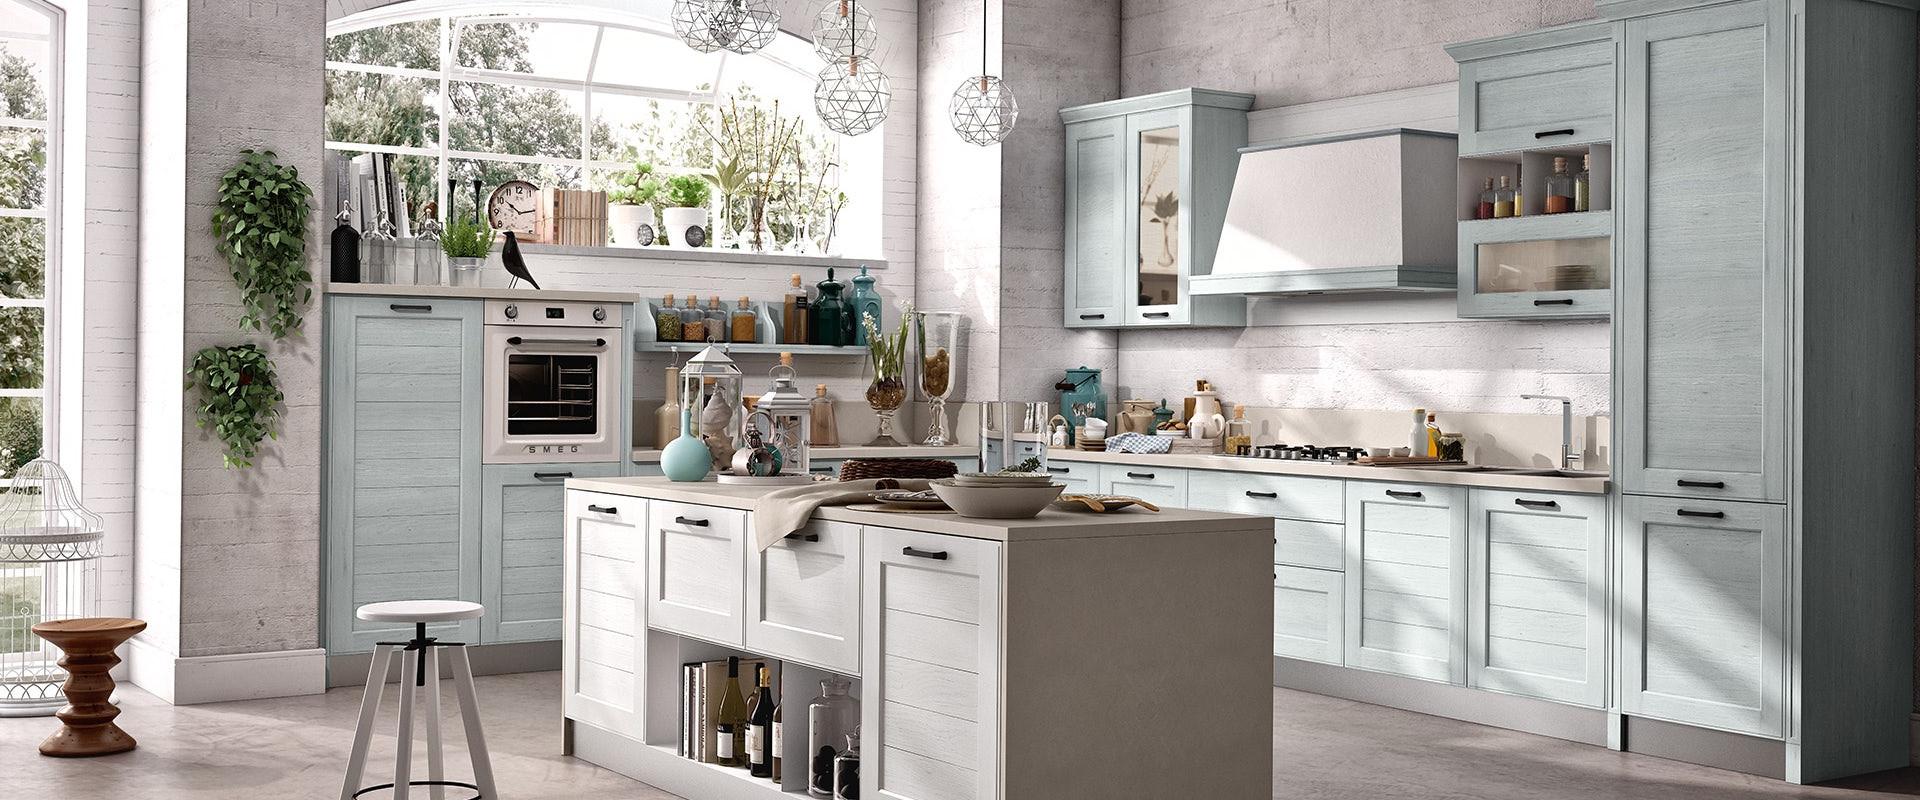 stosa-cucine-classiche-york-228.jpg